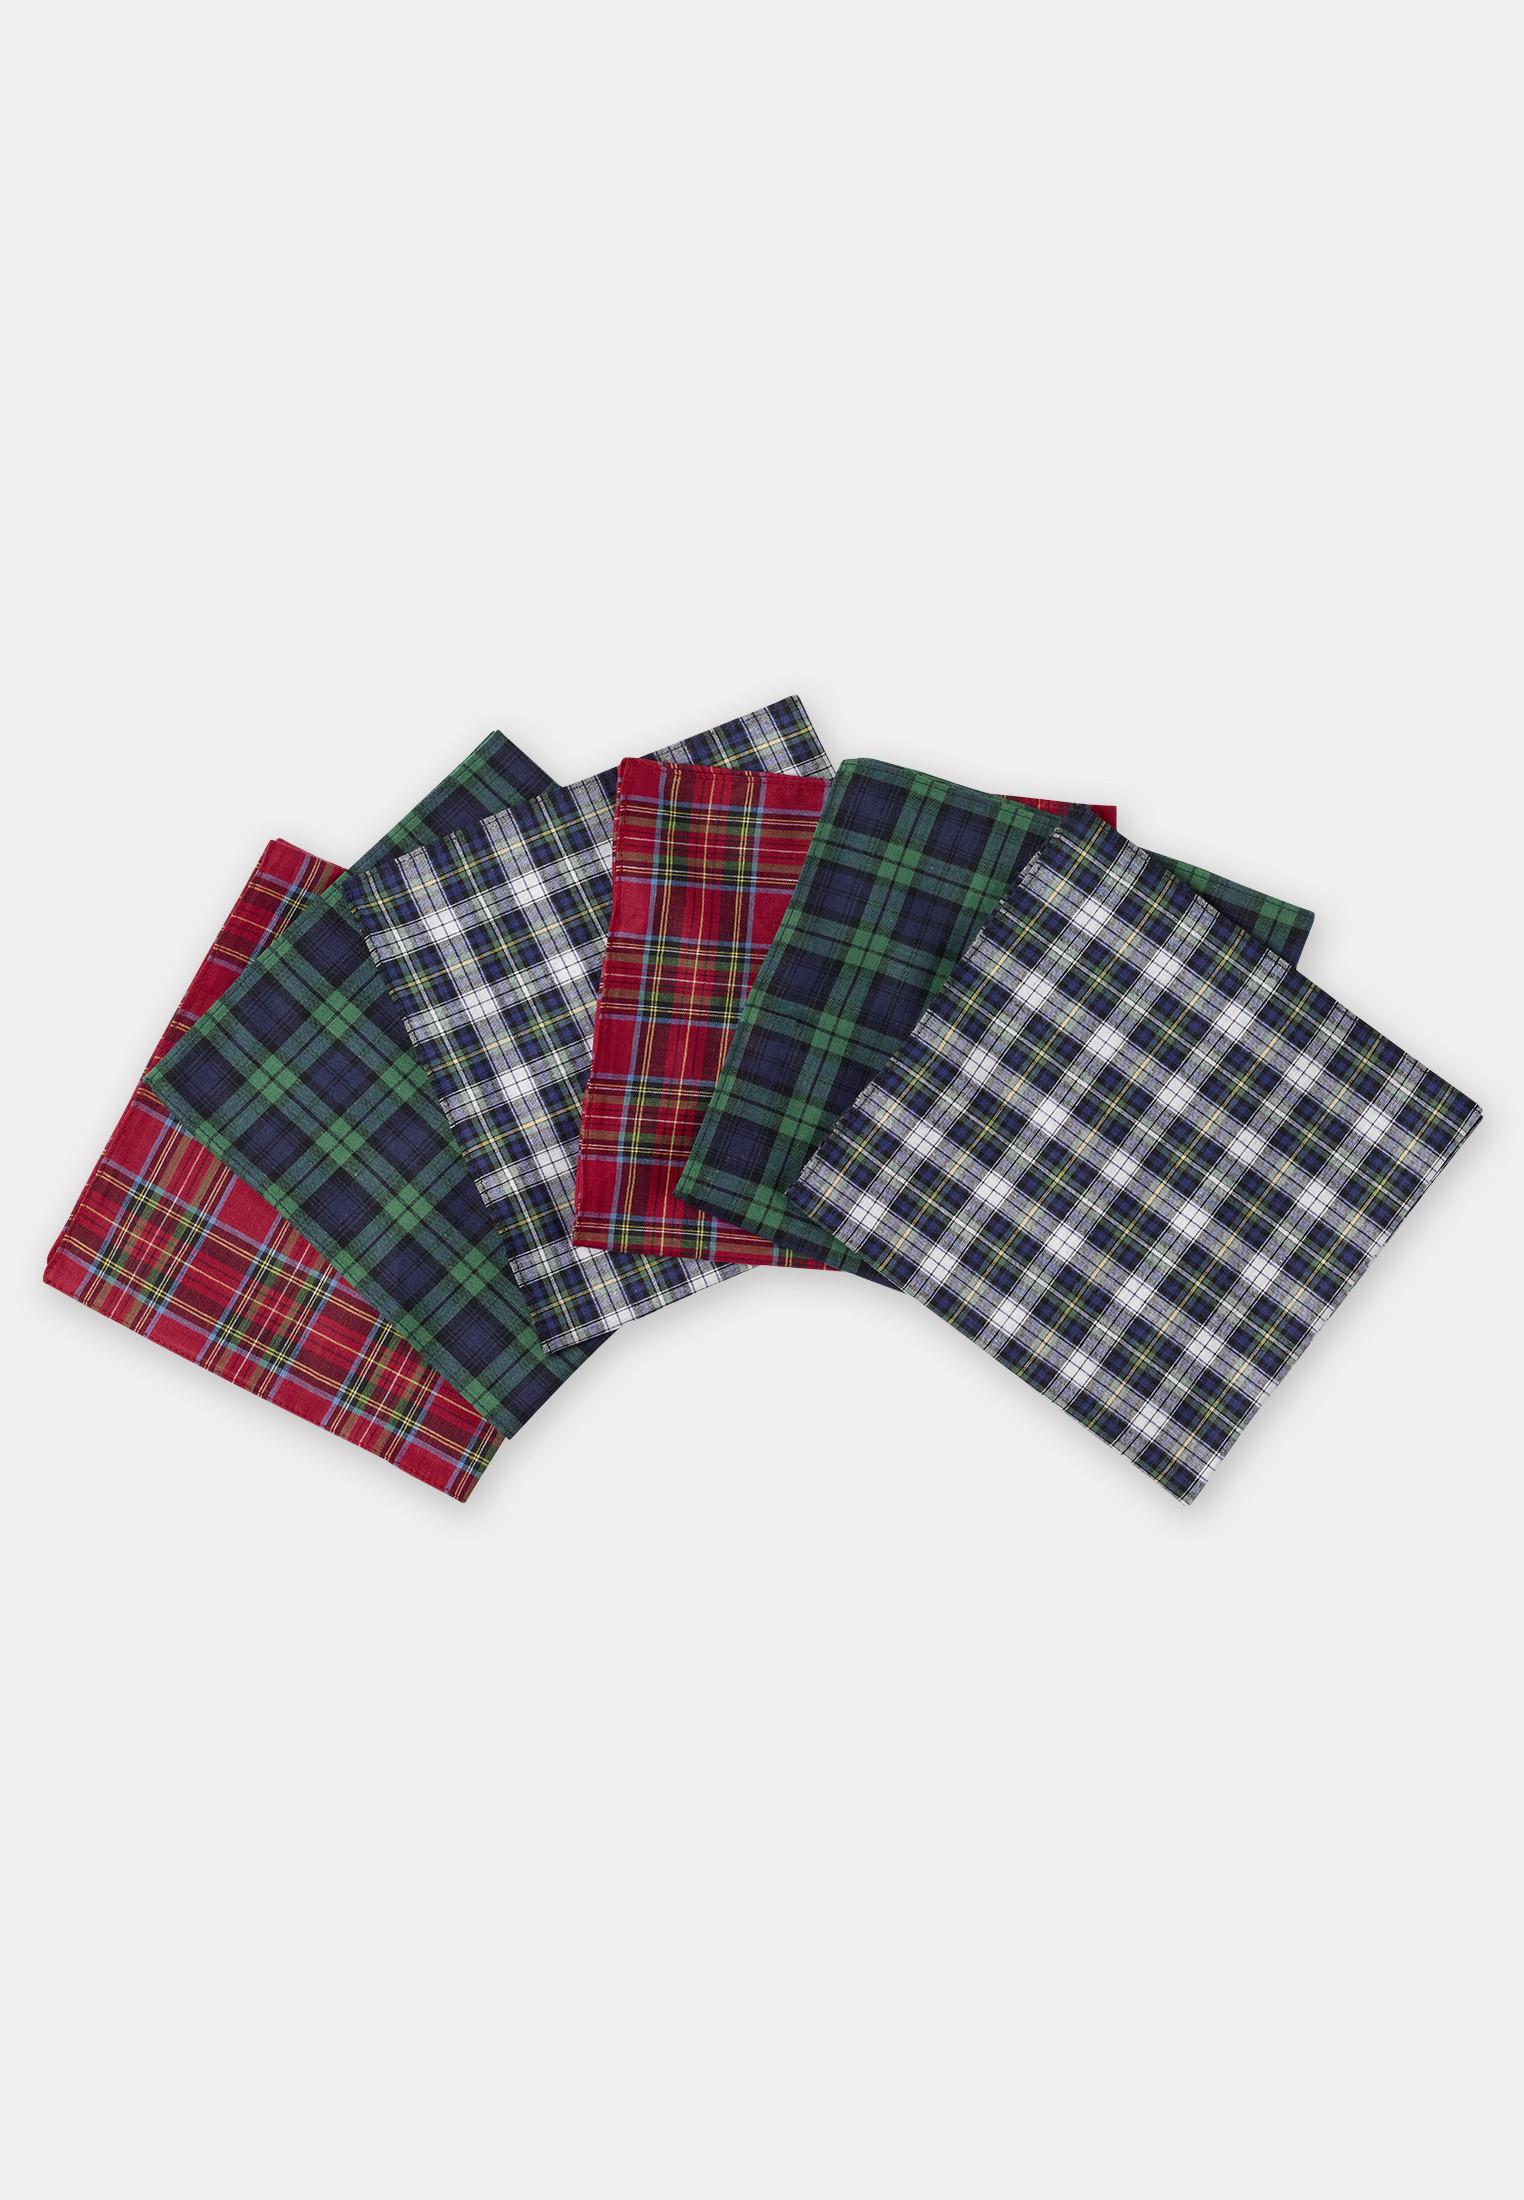 Luxury Handkerchief - Assorted Tartan Check - Presentation Pack of Six